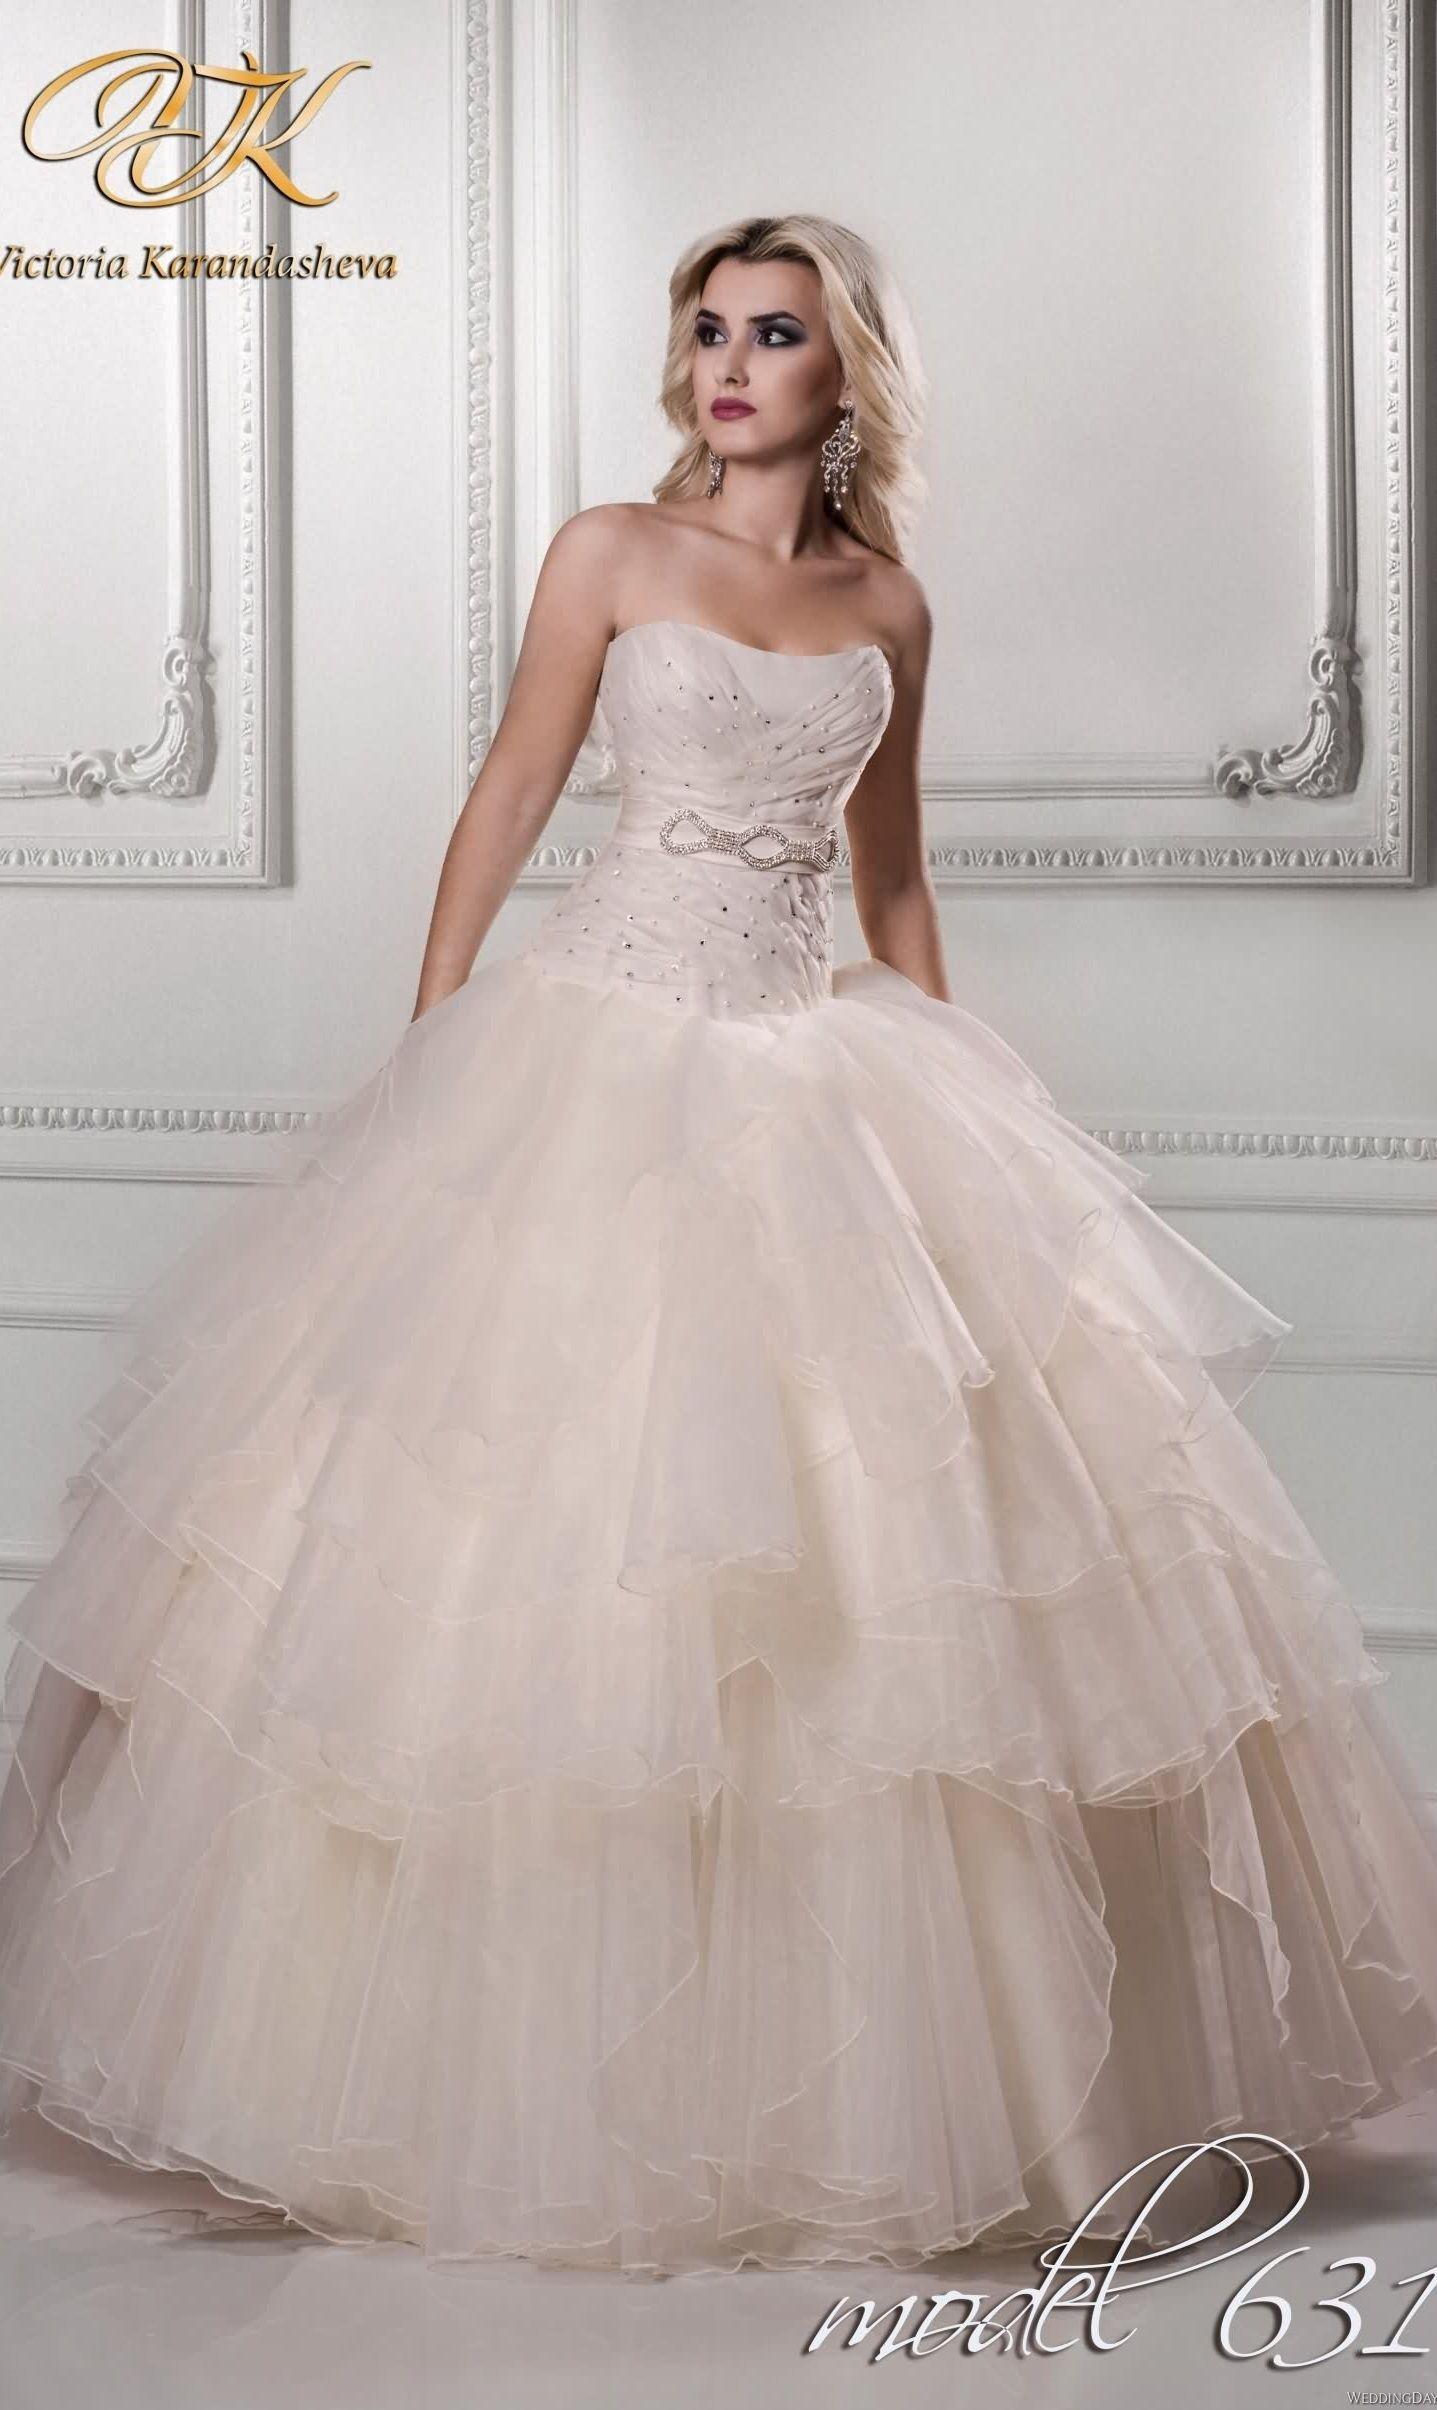 Design your own wedding dress cheap  a pink Cinderella wedding dress from Viktoria Karandasheva  Disney